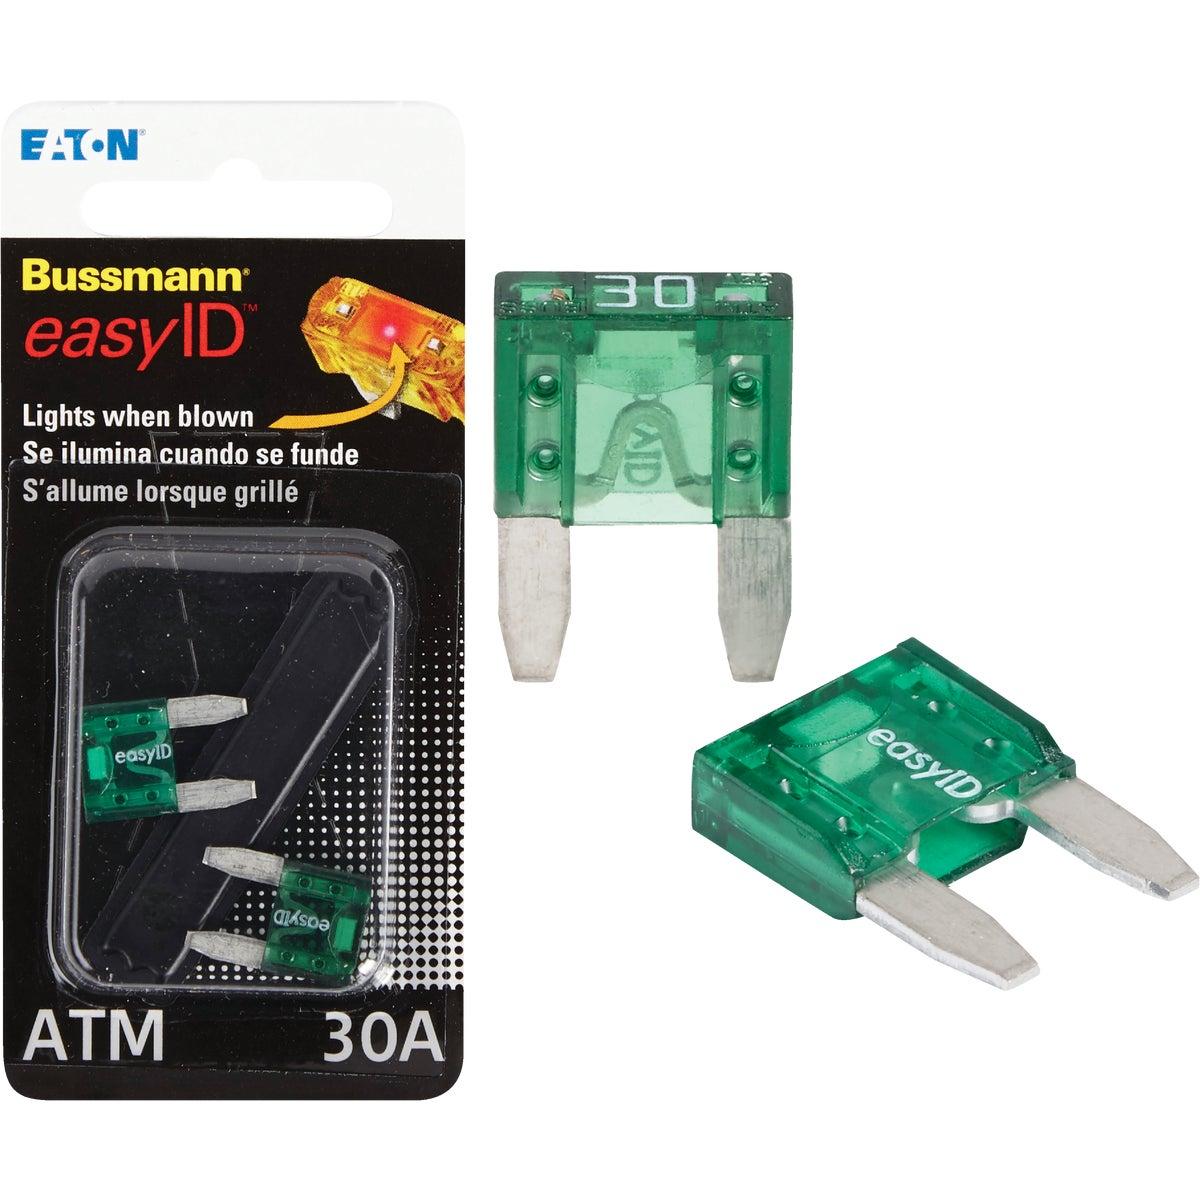 Bussmann 2PK 30A ATM EASY ID FUSE BP/ATM-30ID